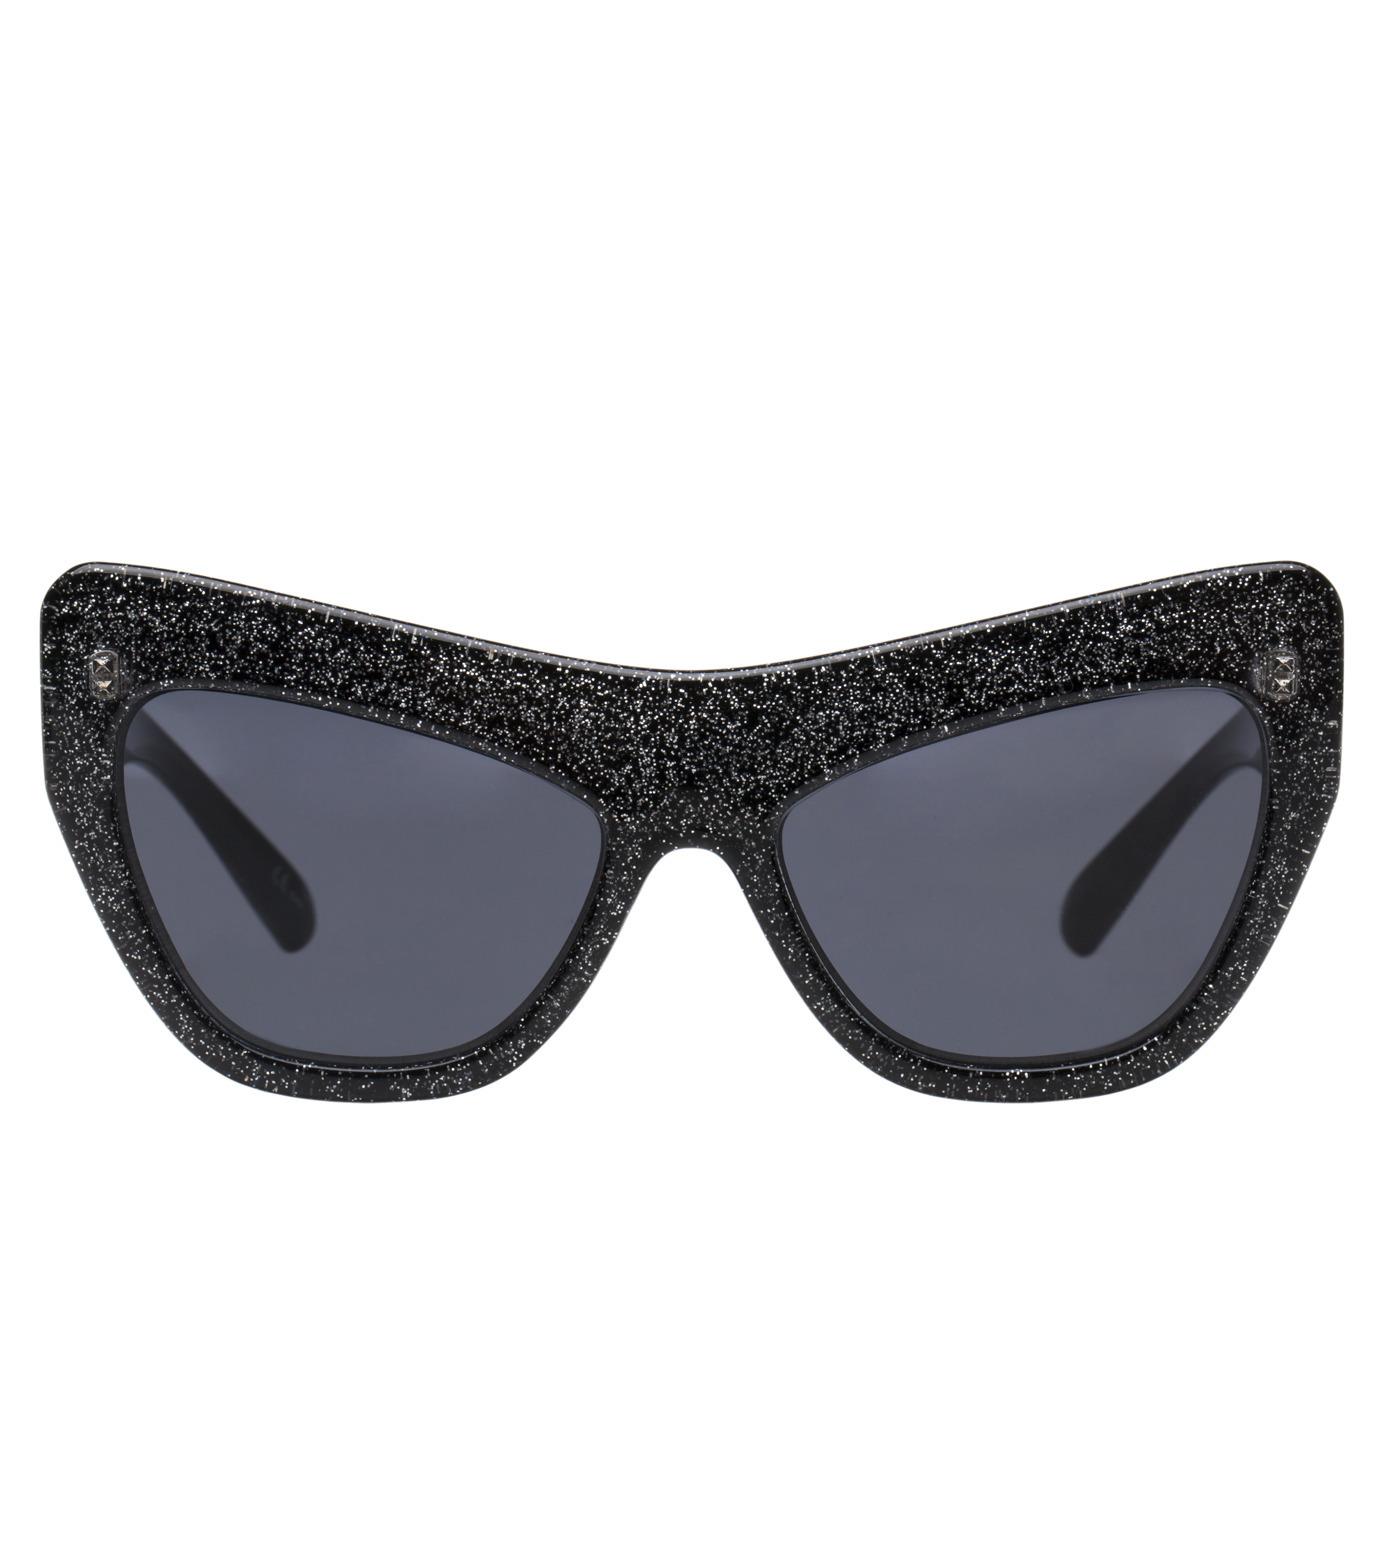 Adam Selman×Le Specs(アダム・セルマン×ル・スペックス)のPlaygirl -Black Glitter / Smoke Mono--GUNMETAL(アイウェア/eyewear)-1502065-6 拡大詳細画像2